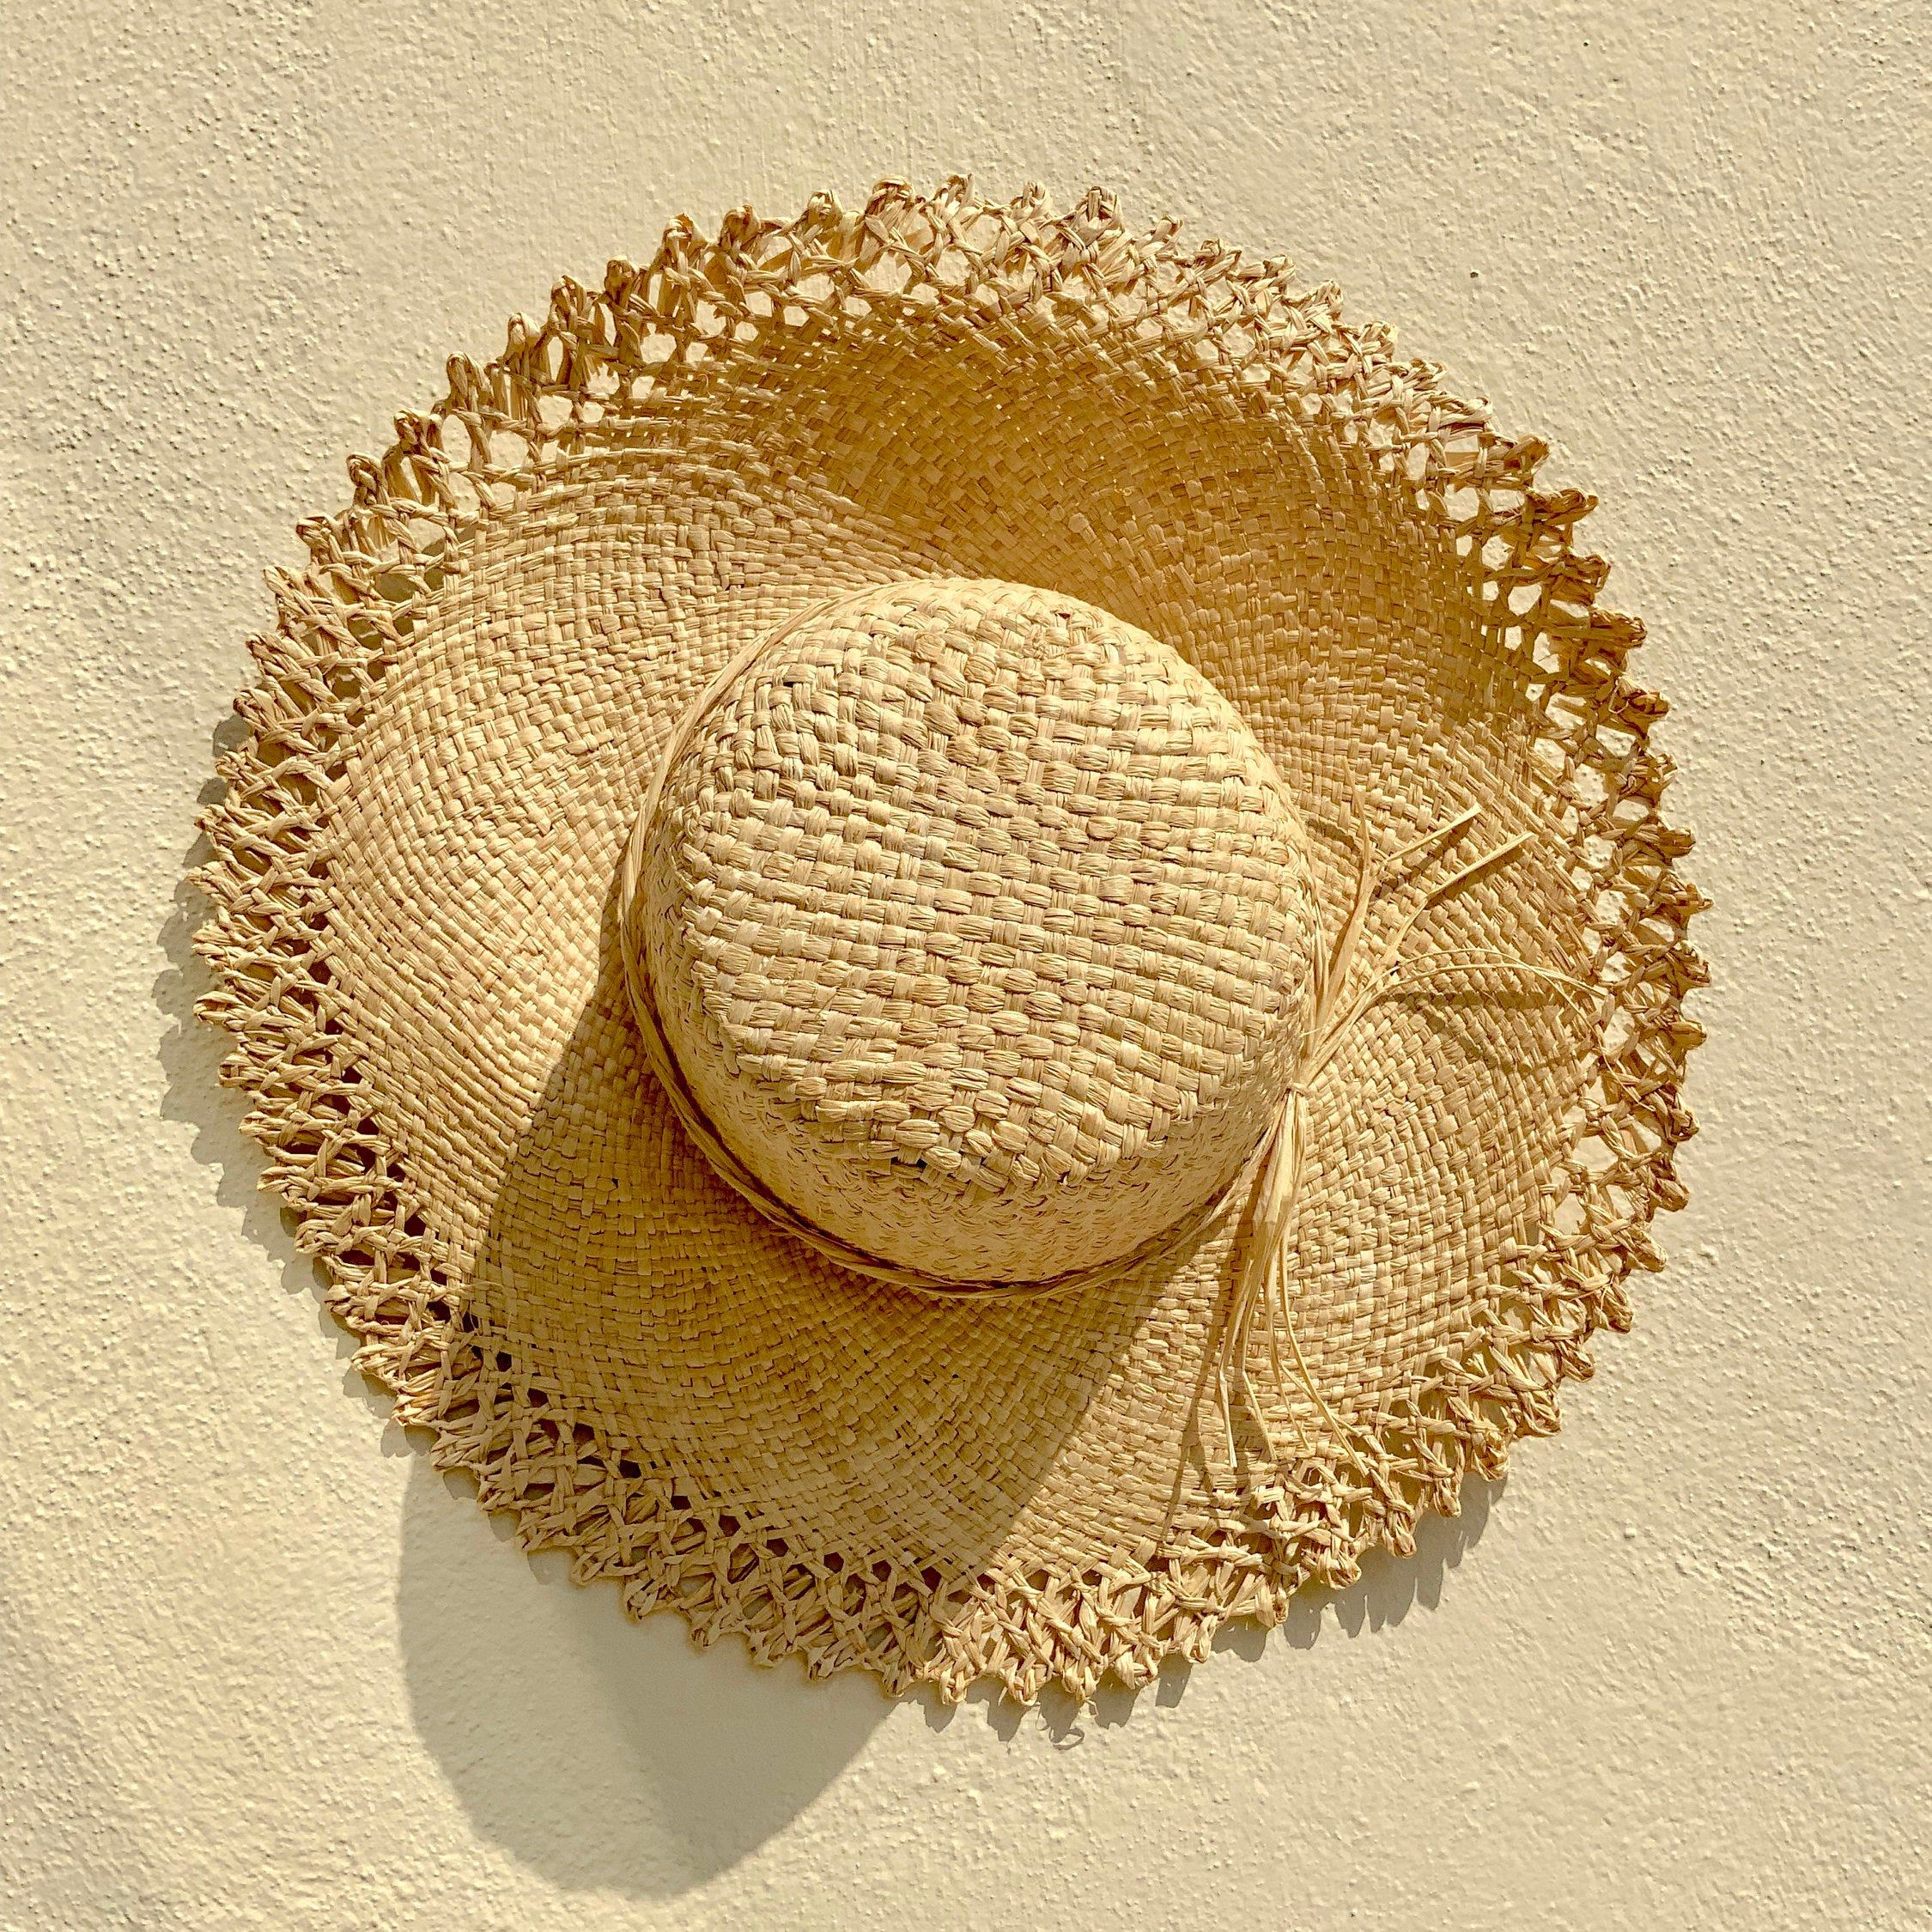 French Woven Edge Straw Hat Raffia Hat Sun Hat Beach Hat Etsy In 2020 Raffia Hat Straw Hat Beige Hat